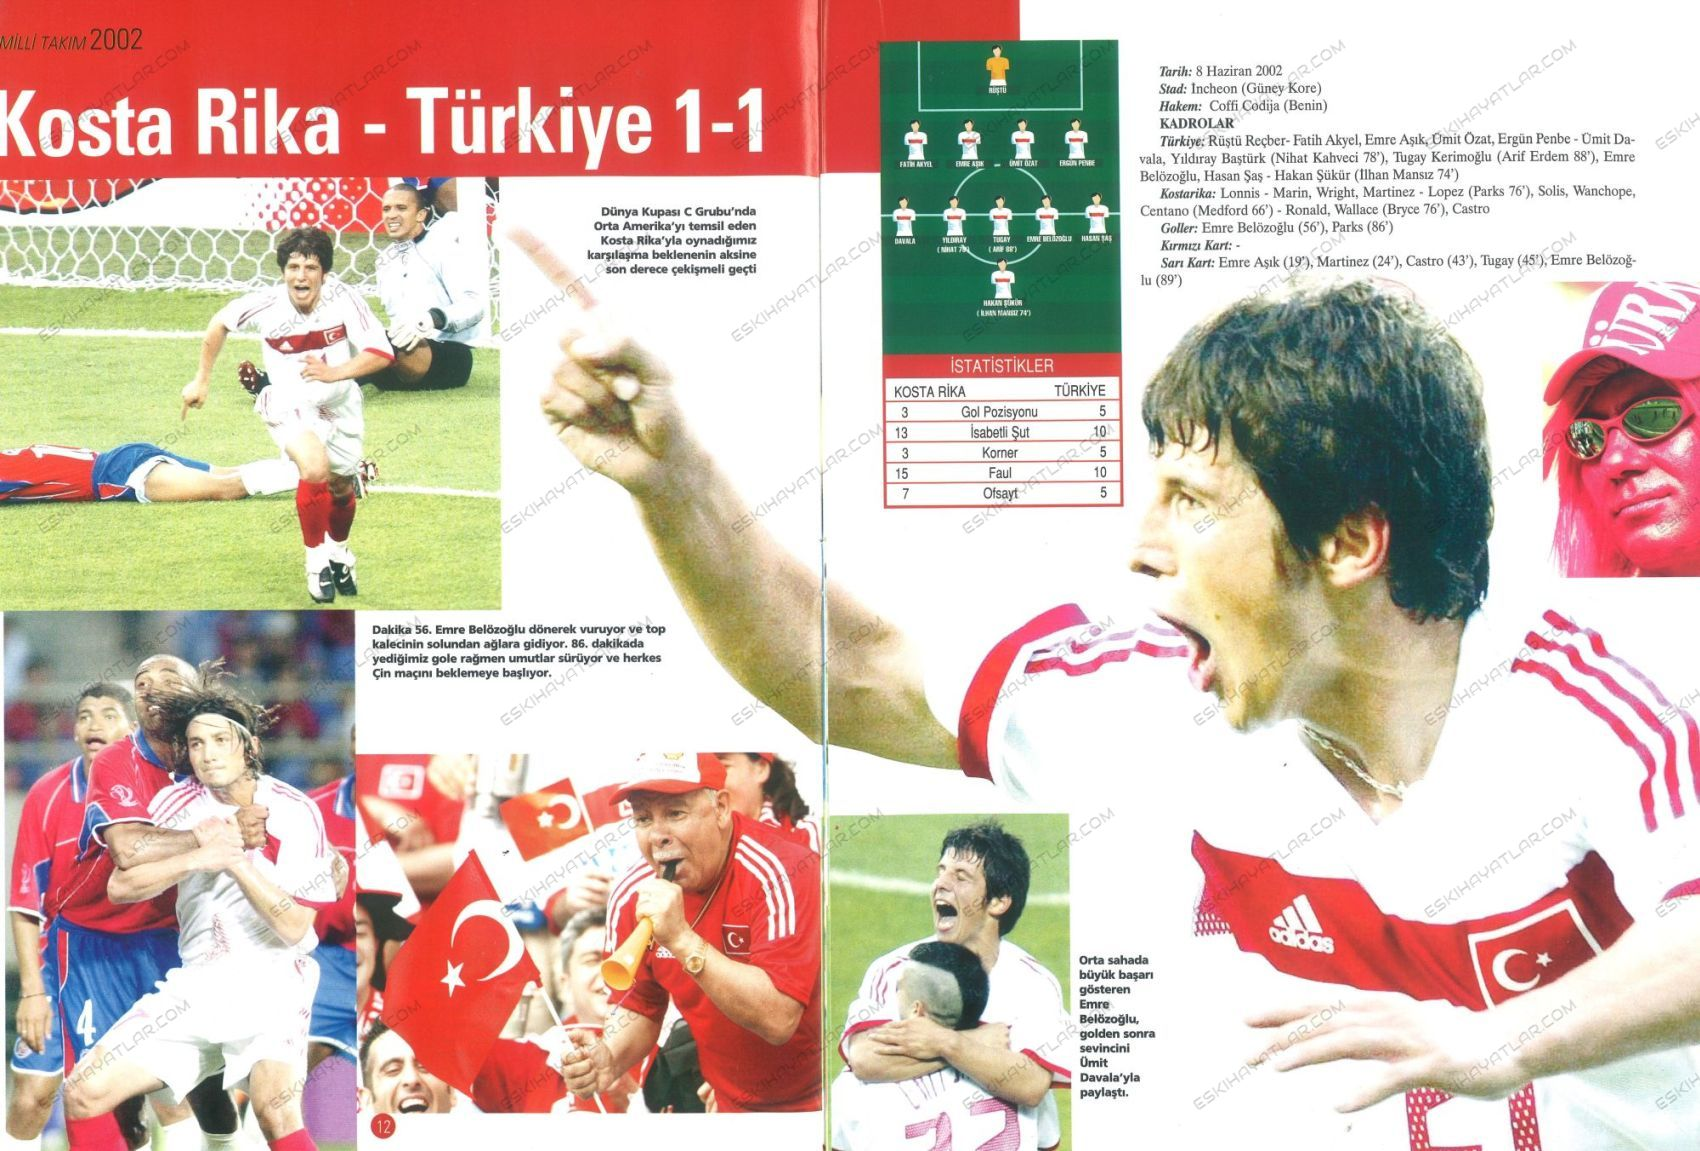 0406-turkiye-a-milli-takimi-2002-dunya-kupasi-kadrosu-aktuel-dergisi (6)